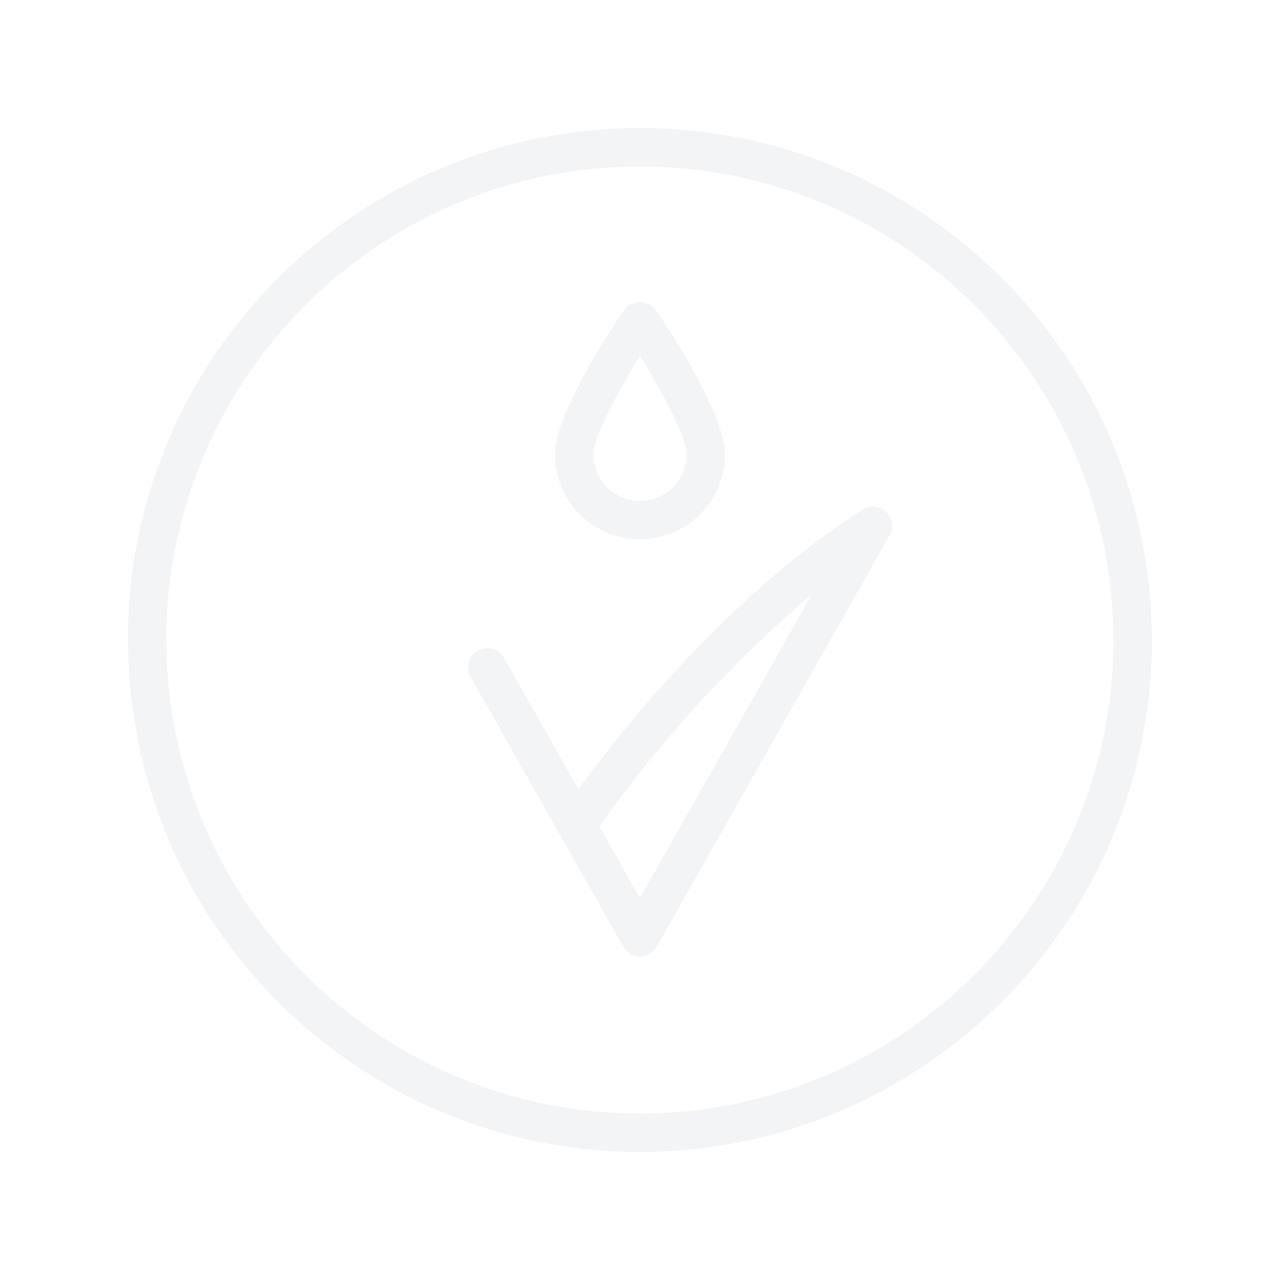 JAMES BOND 007 Cologne Deodorant Spray дезодорант для тела 150ml